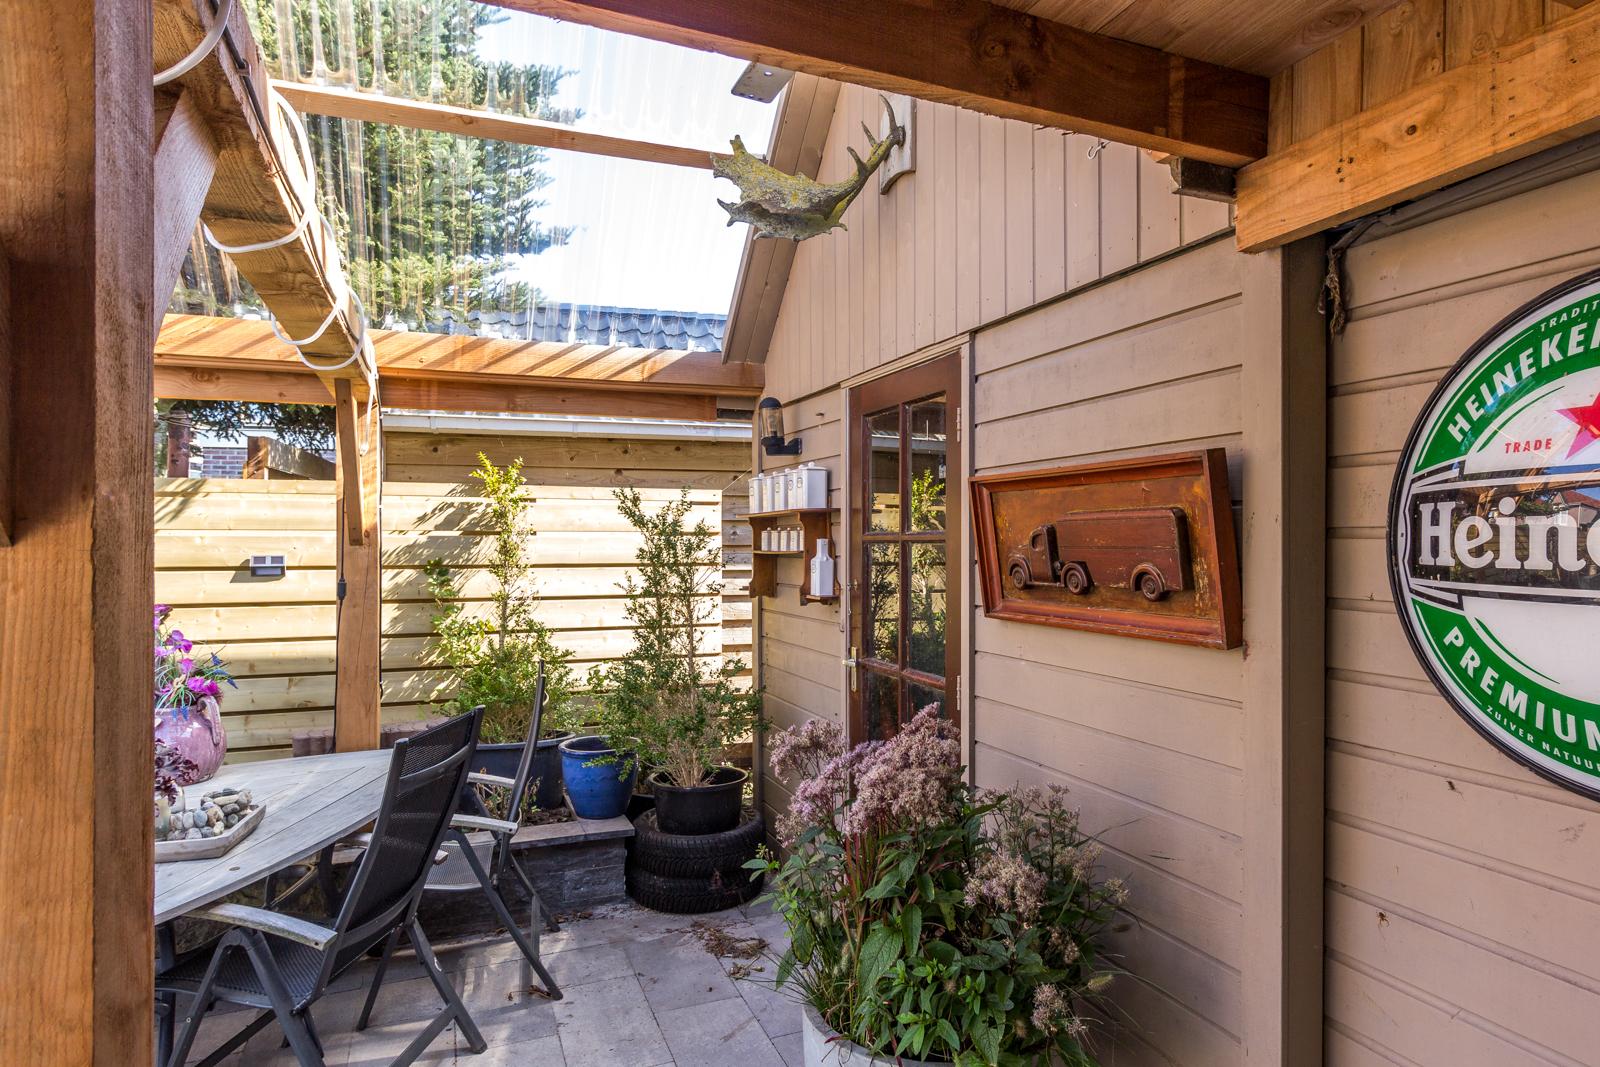 veranda-Den-Oever-5322